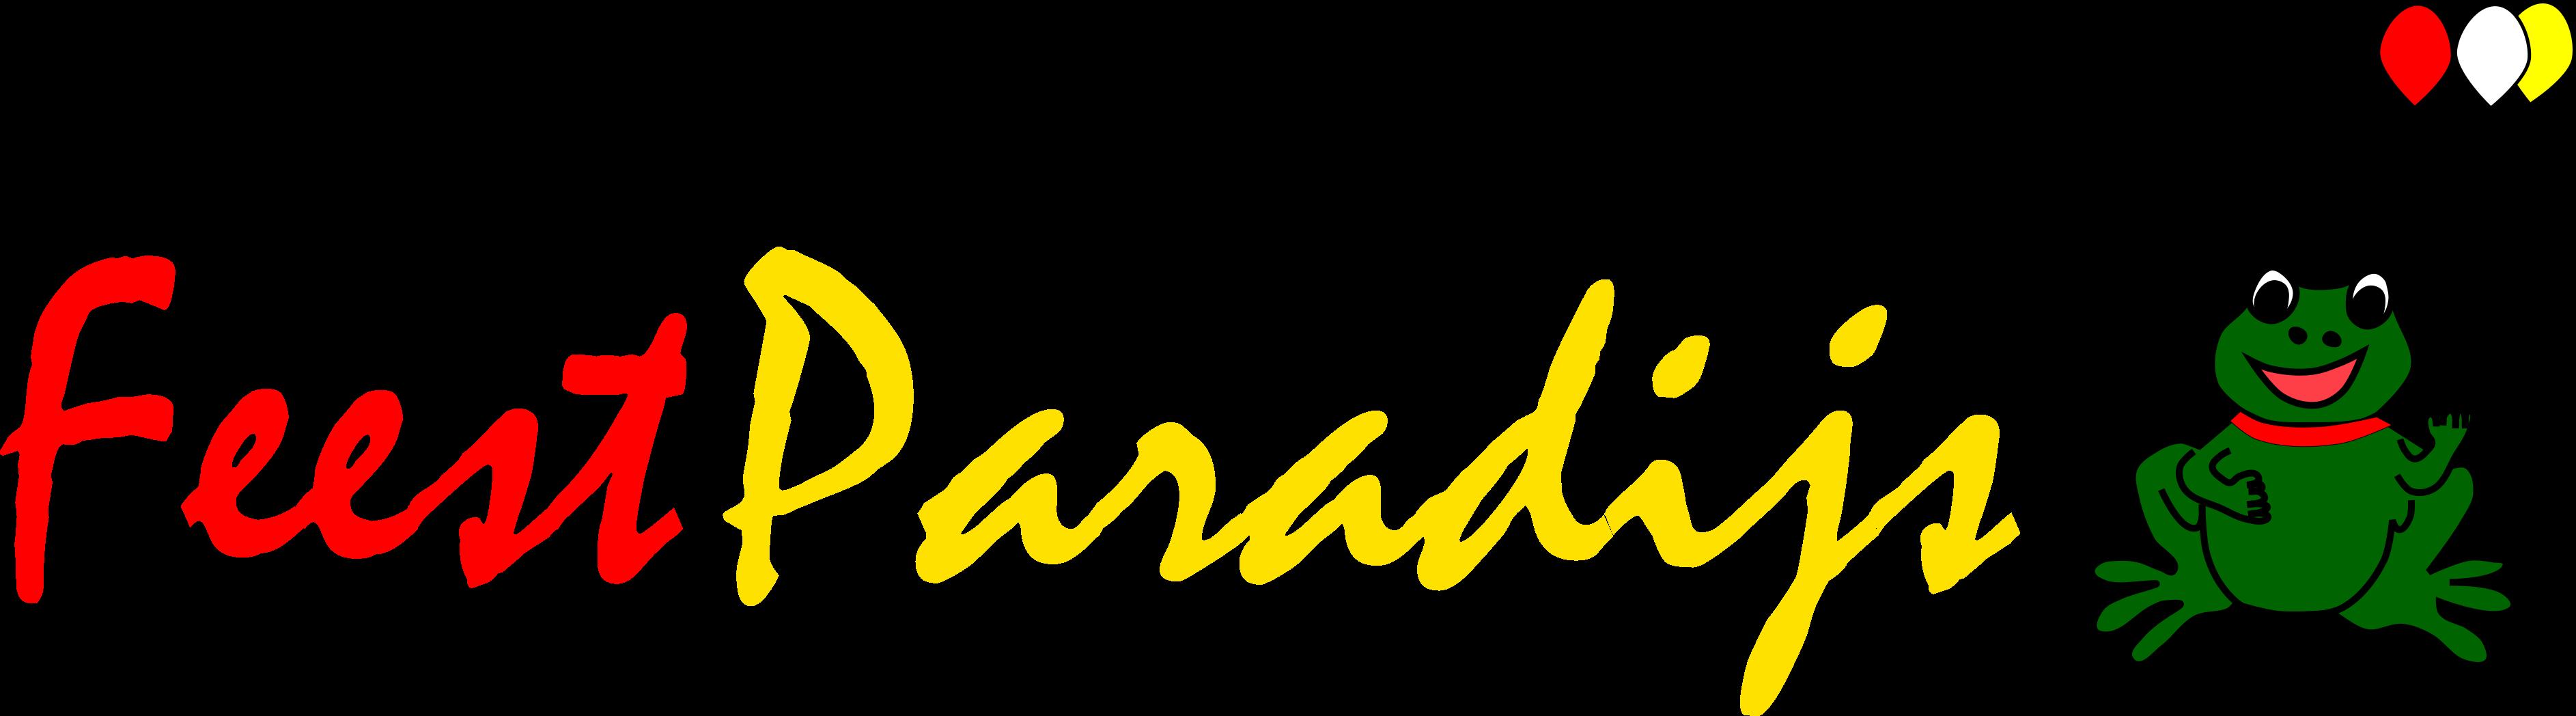 Feestparadijs